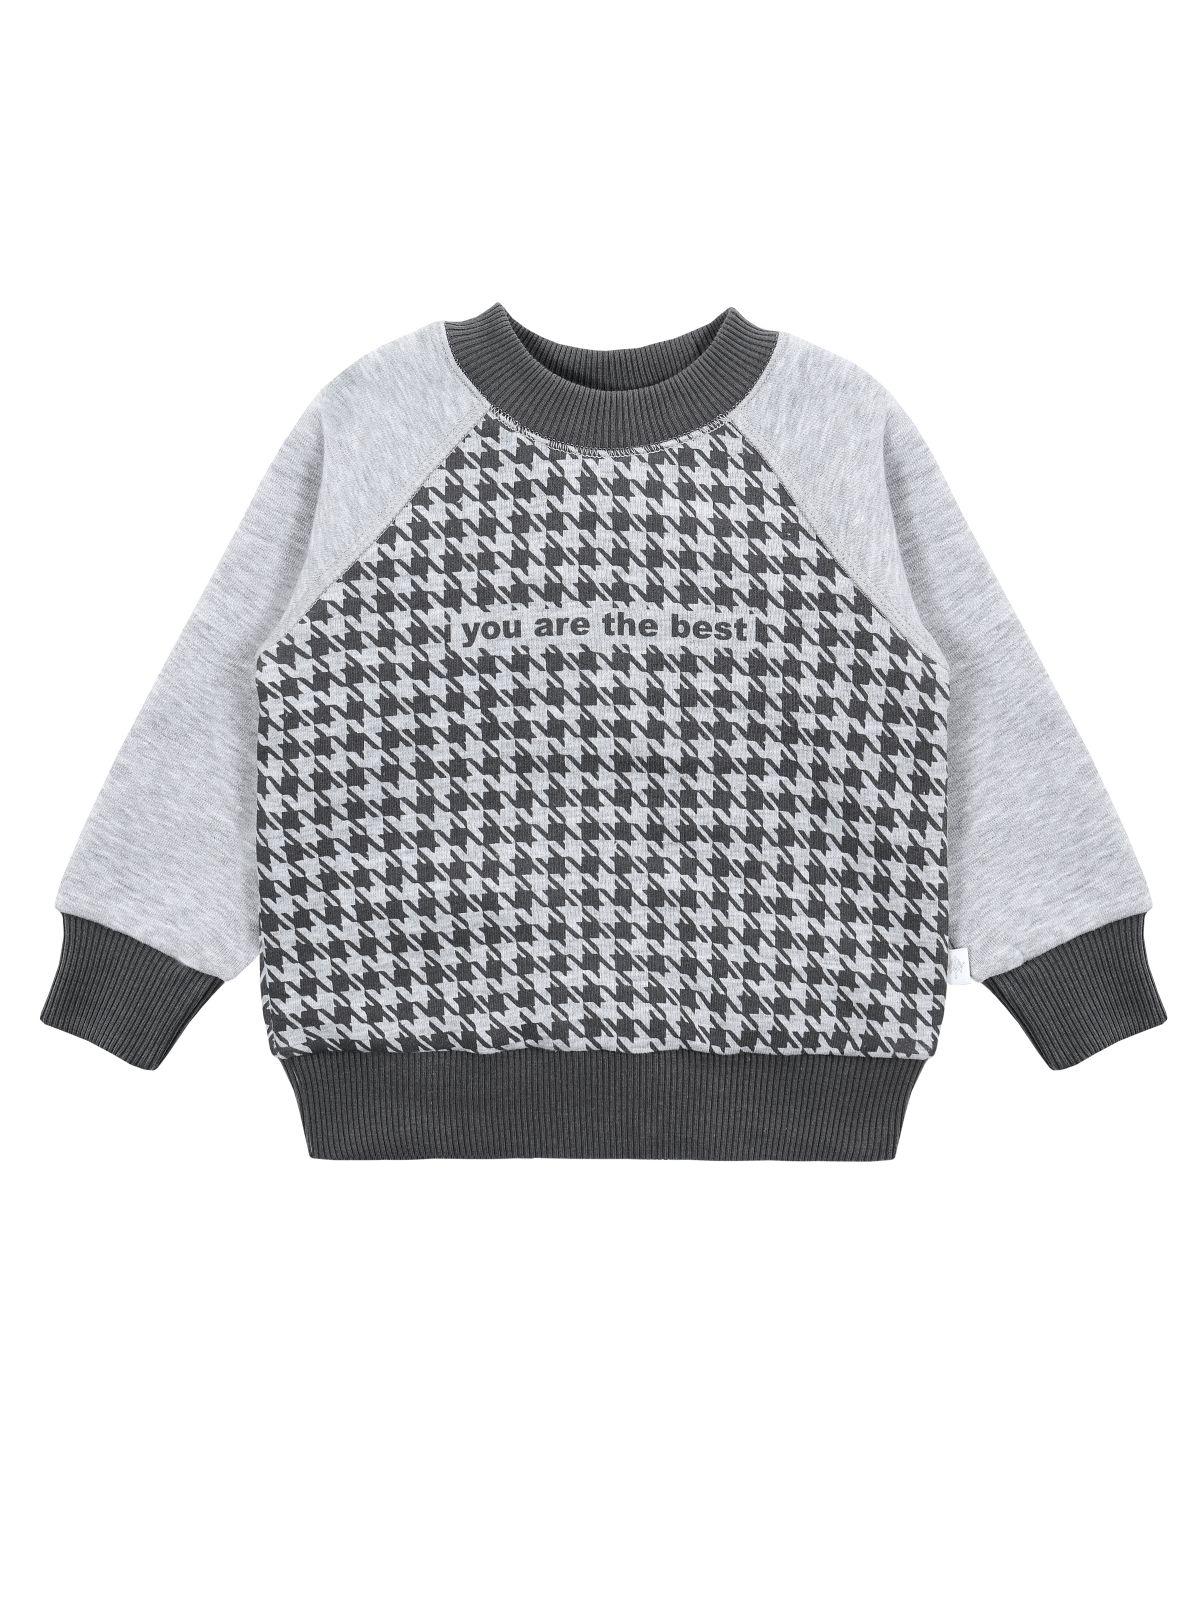 Джемпер для мальчика Мамуляндия 19-926 Футер, Серый меланж р.104 фото